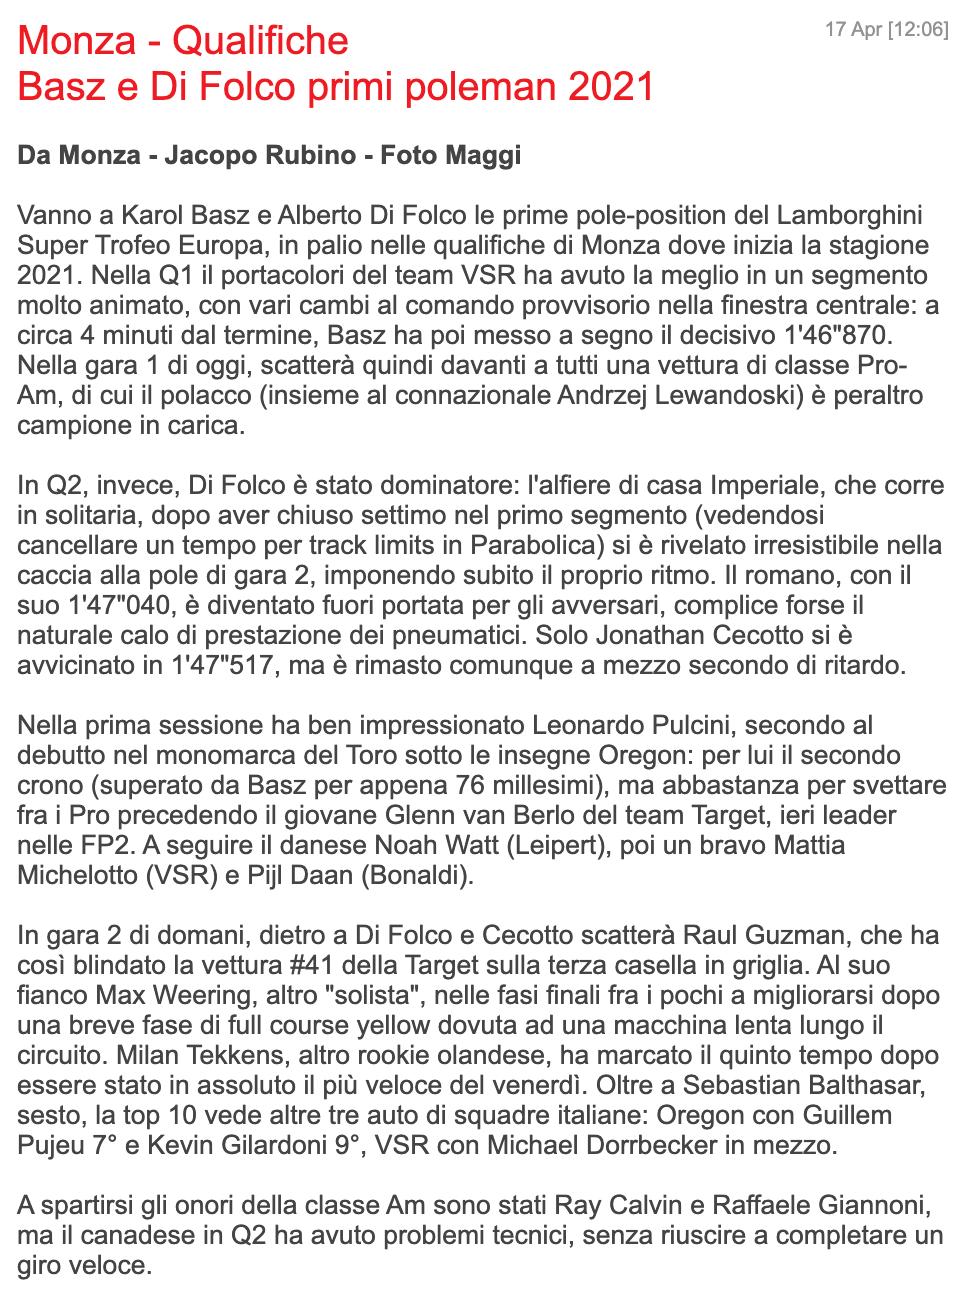 ITALIARACING.NET 20210417